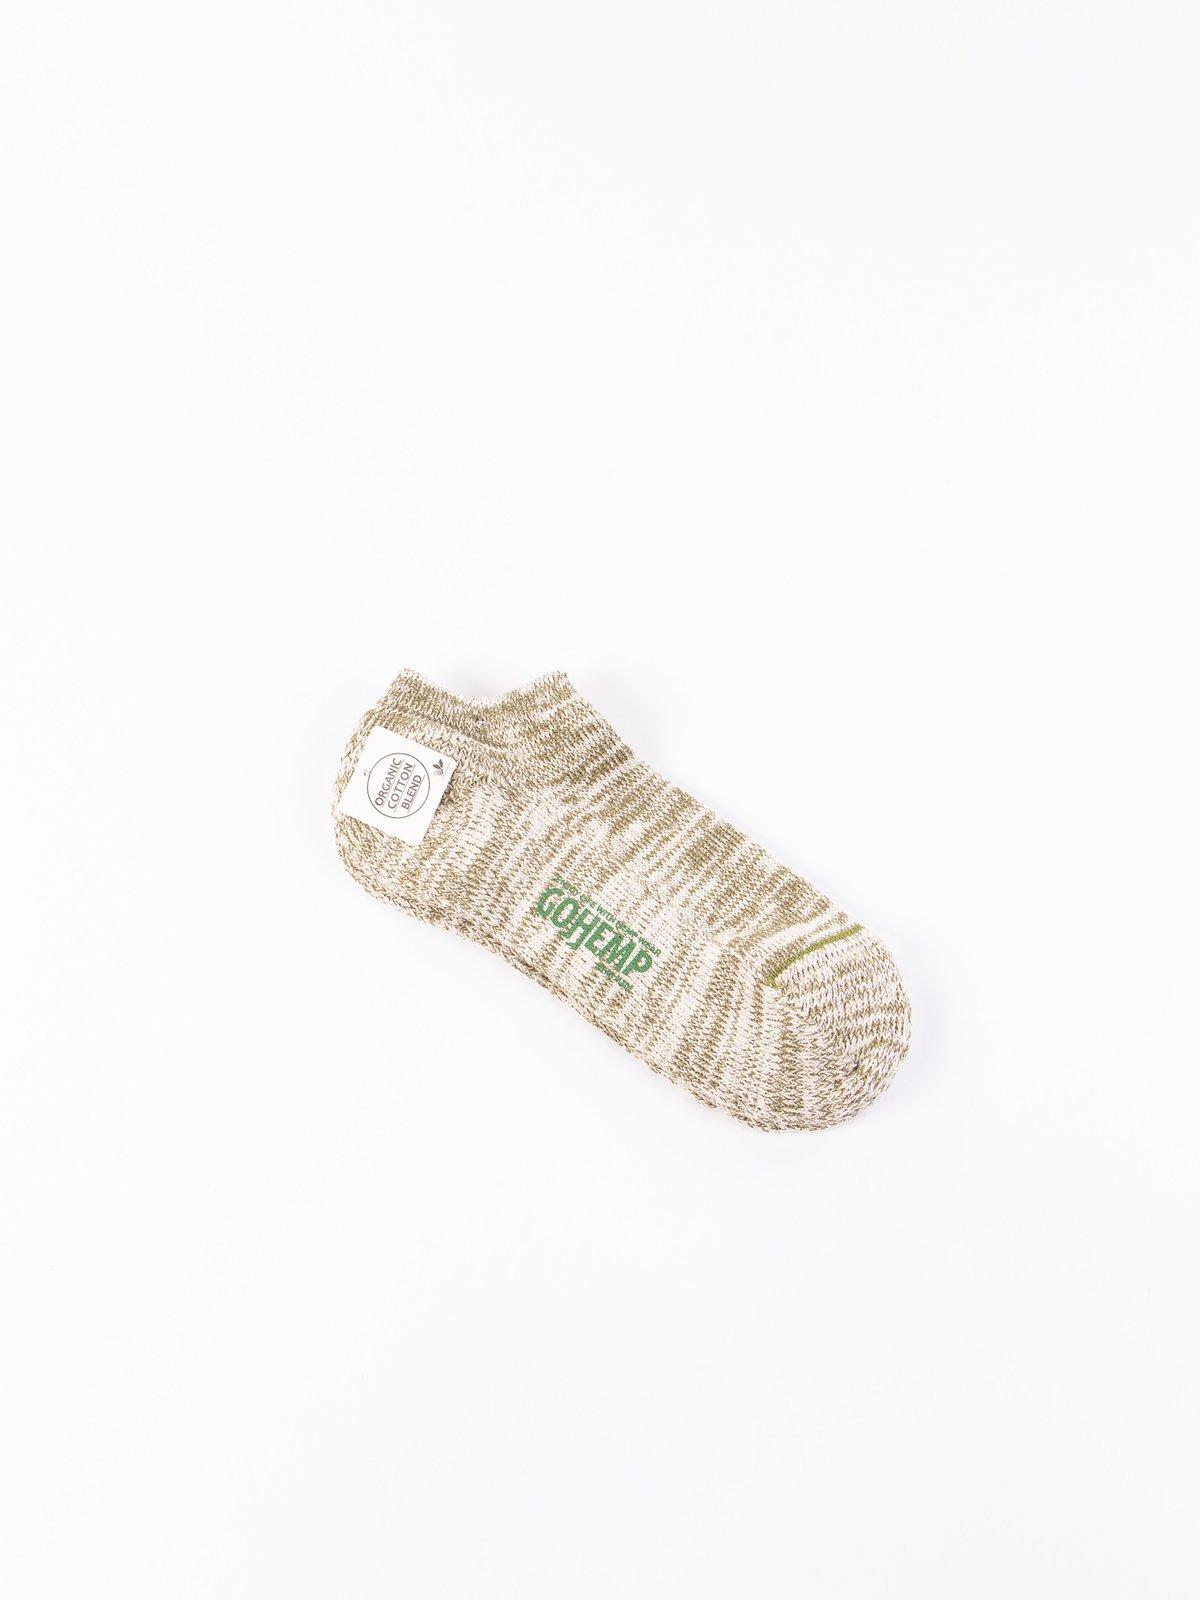 Khaki Go Hemp OC Pile Ankle Socks - Image 1